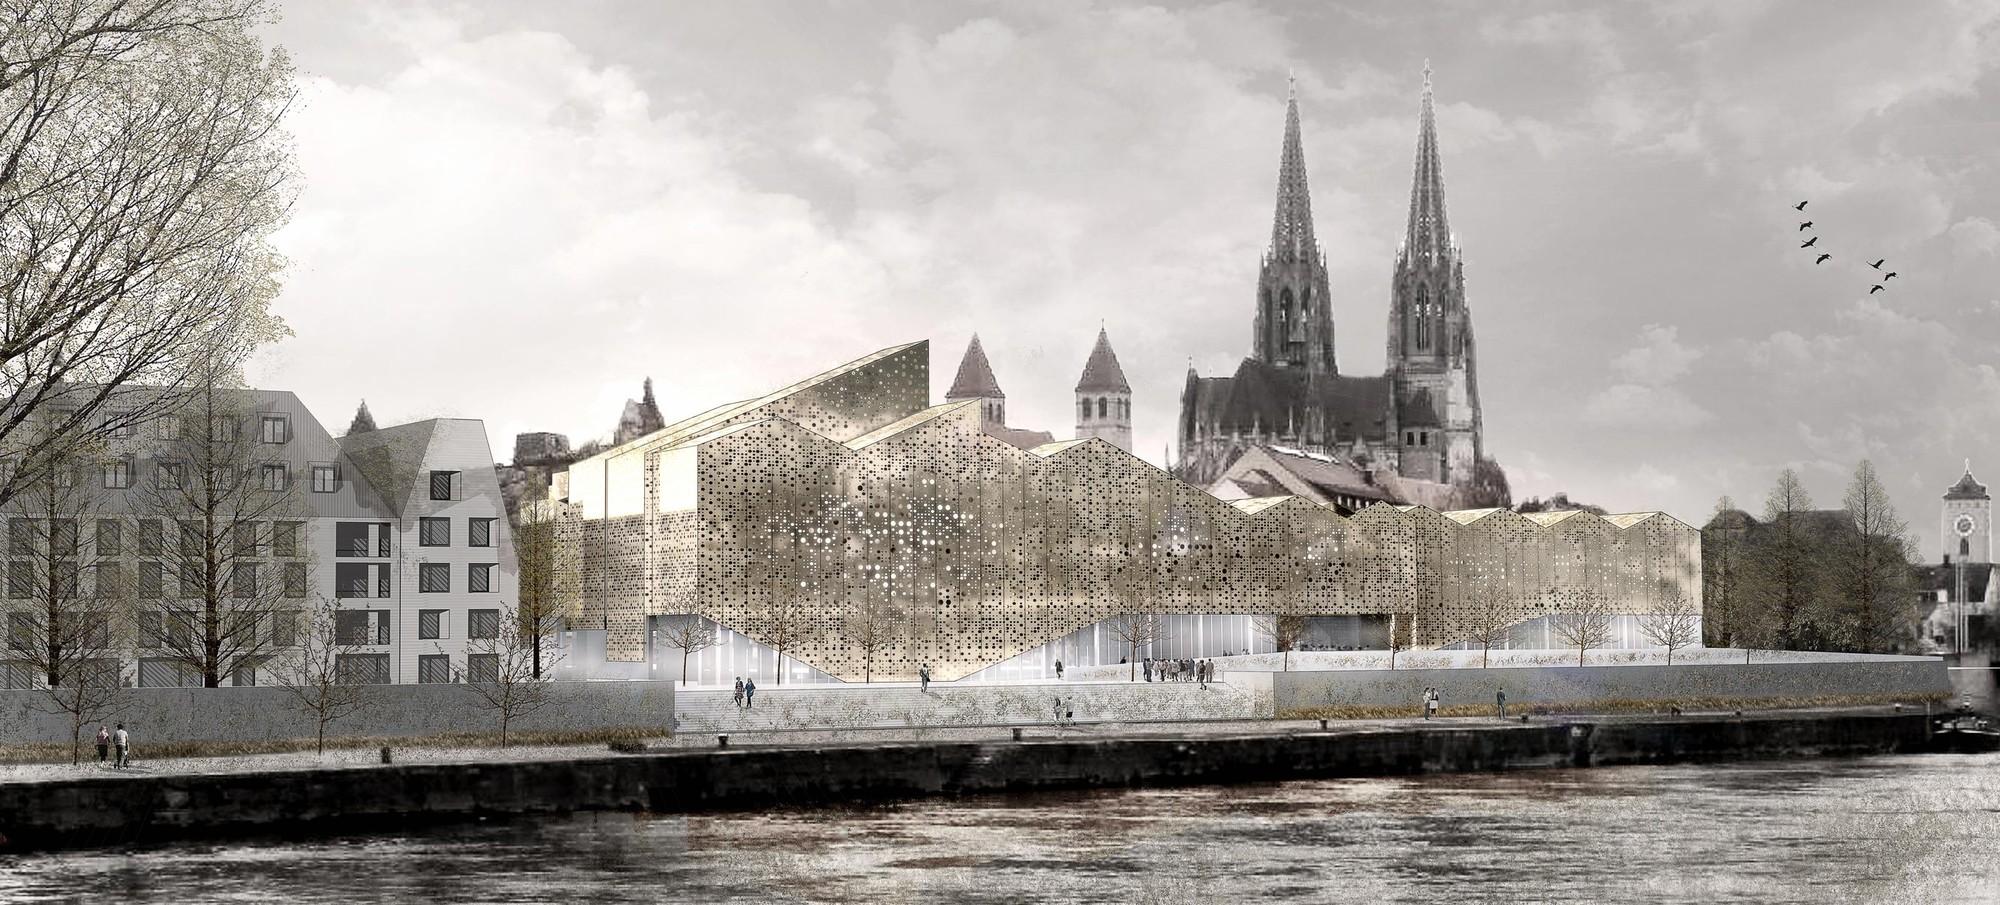 Bavarian History Museum Competition Entry / X+UN Architecture, Courtesy of X+UN Architecture